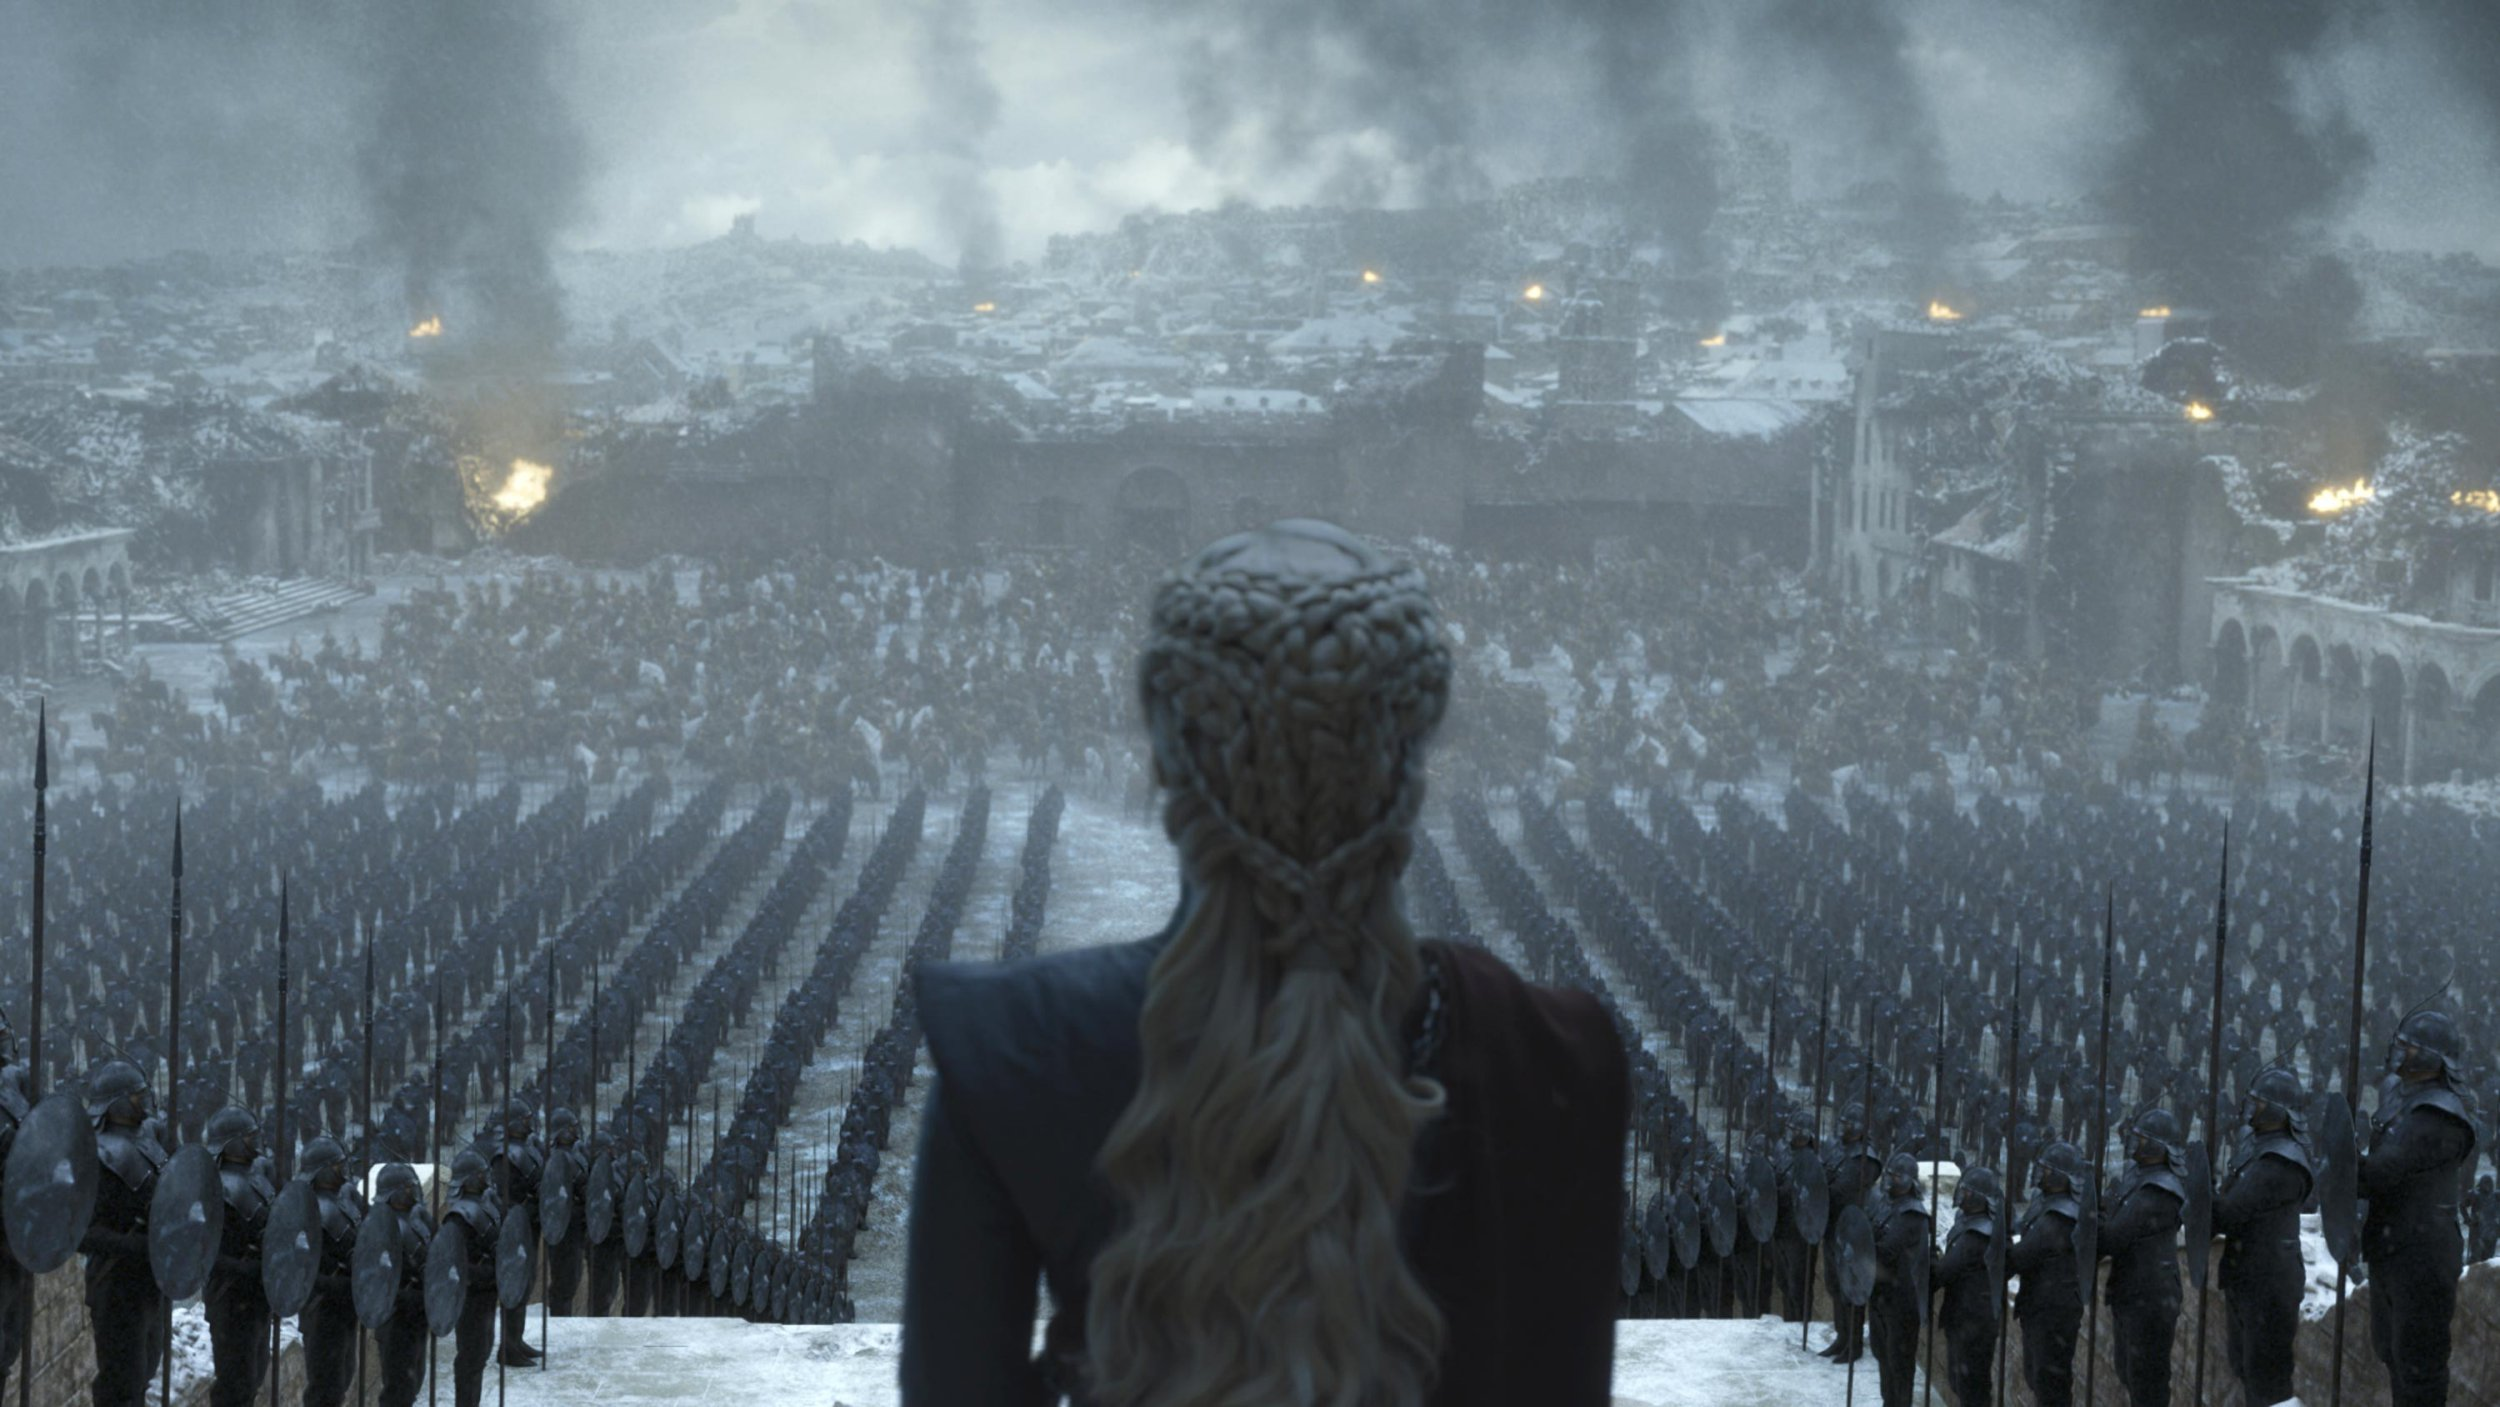 Daenerys addressing the Kings Landing in Game Of Thrones